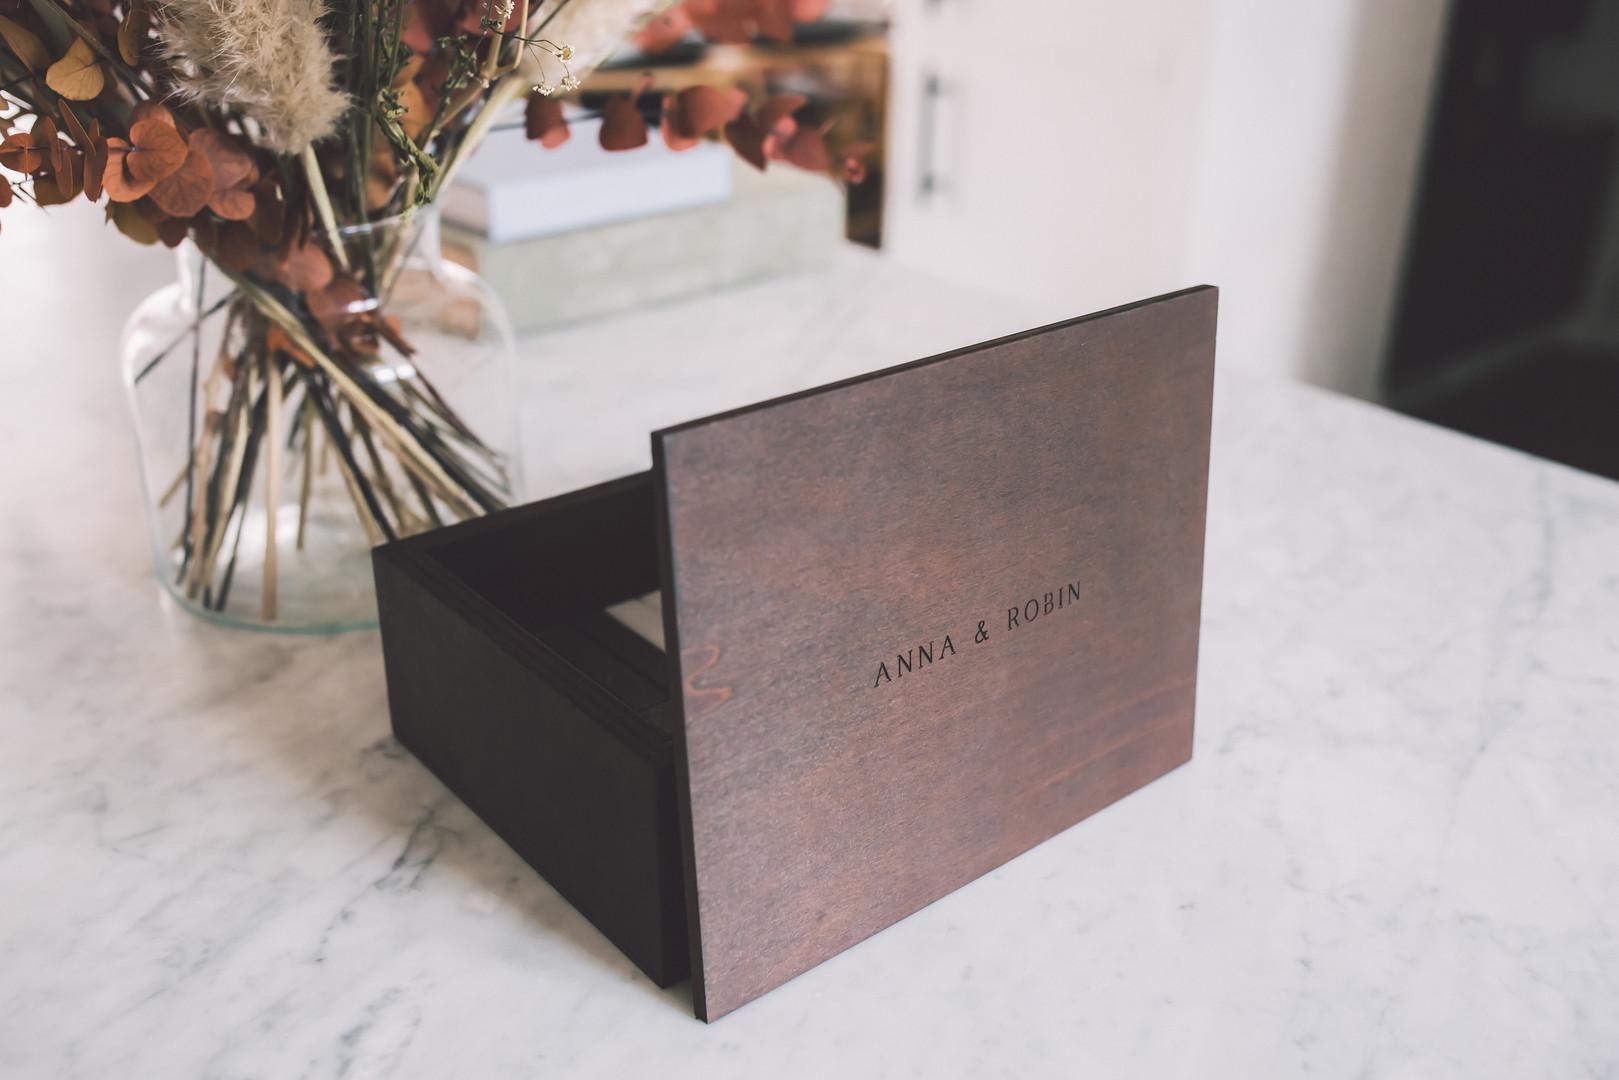 Engraved oak collector box